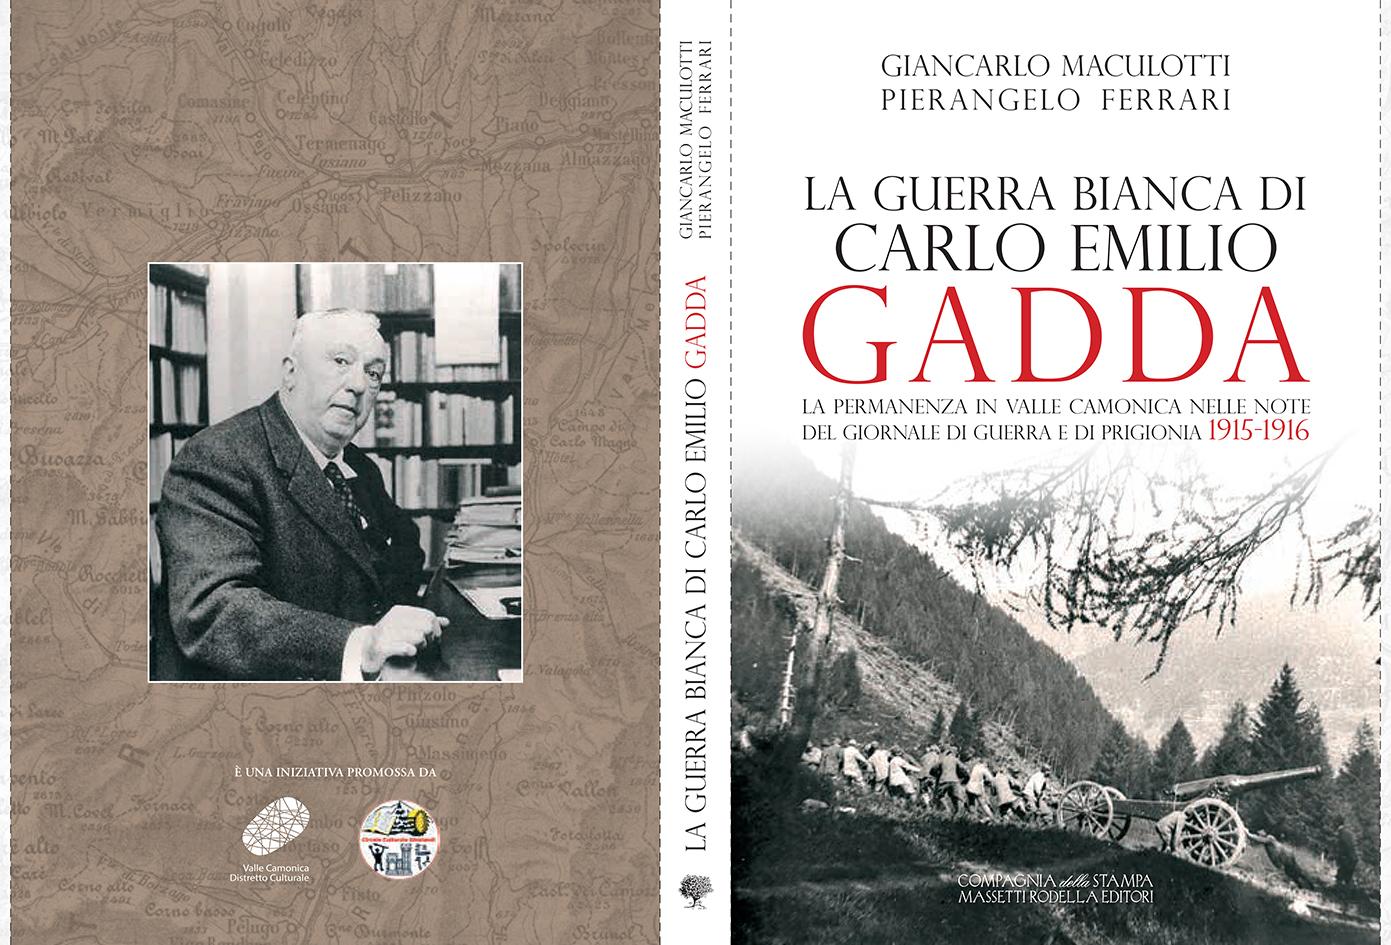 1_La Guerra bianca di Carlo Emilio GADDA _copertina